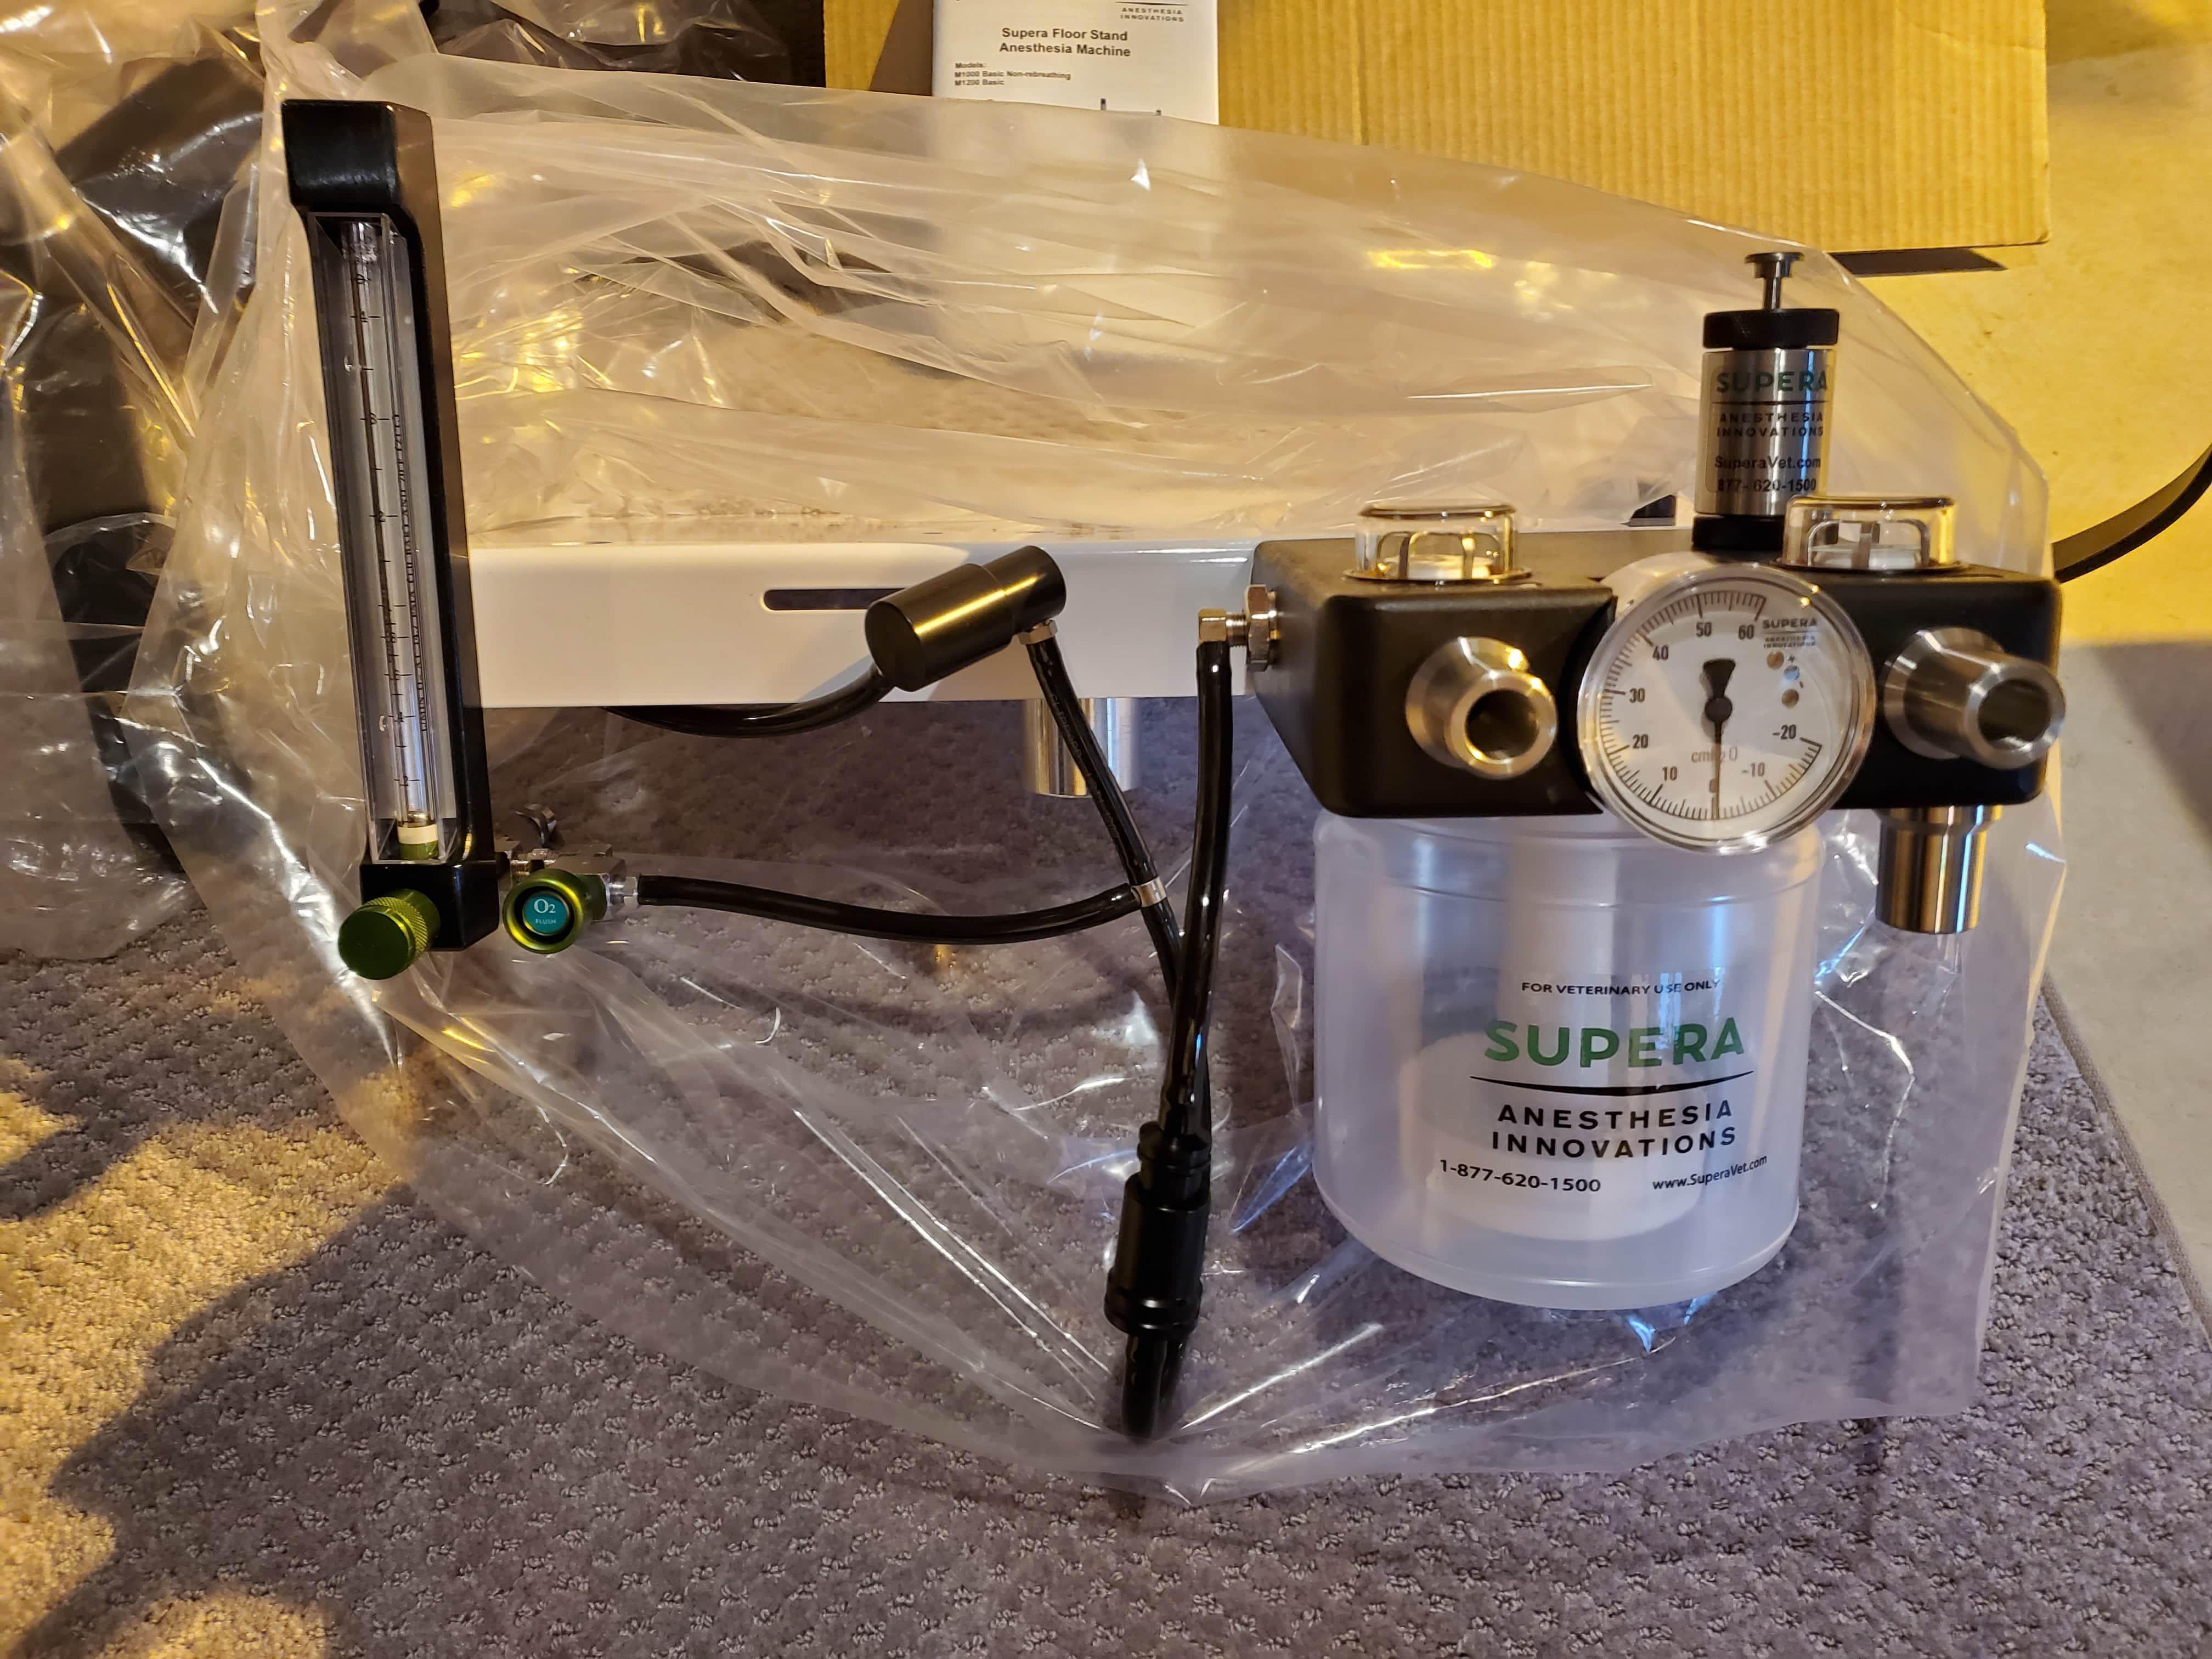 Supera M1200 veterinary anesthesia machine (never used) and EVC3000 gas evac system (zero hours)